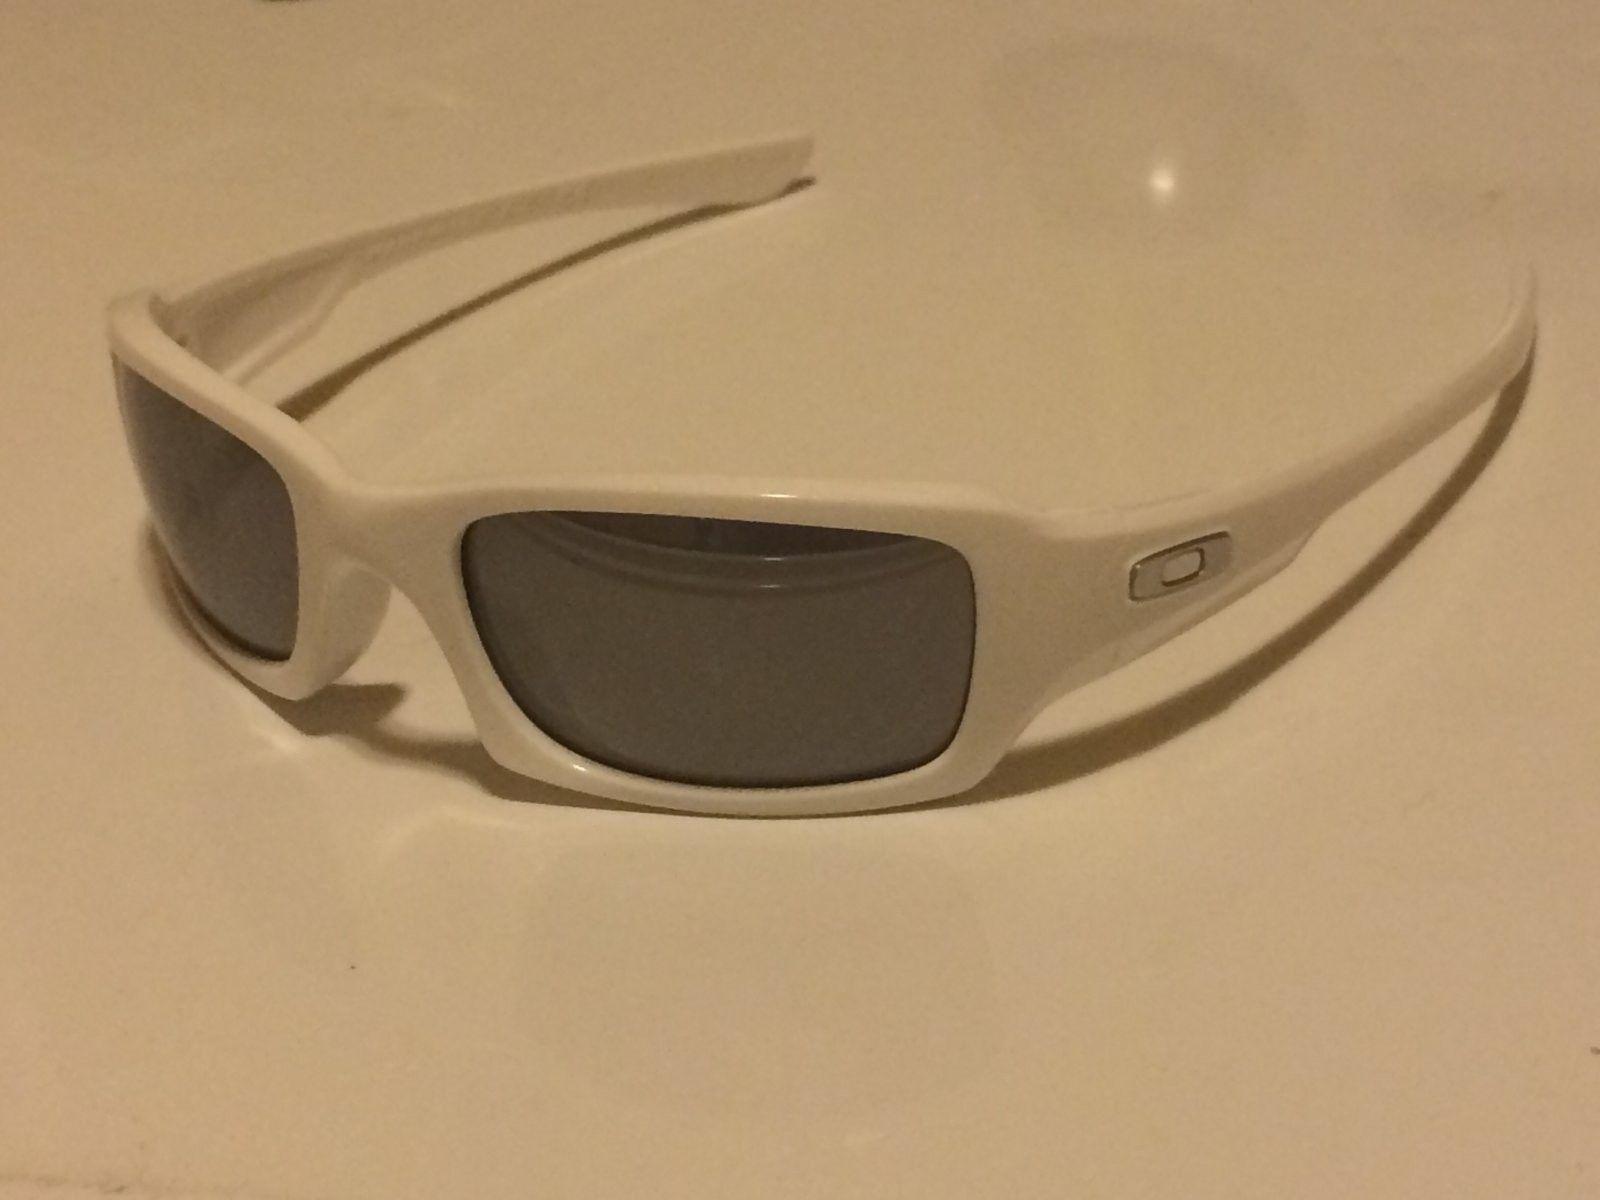 9a307c10c3 Fives Squared Polished White Black Iridium New (Minor Defect) - image.jpg